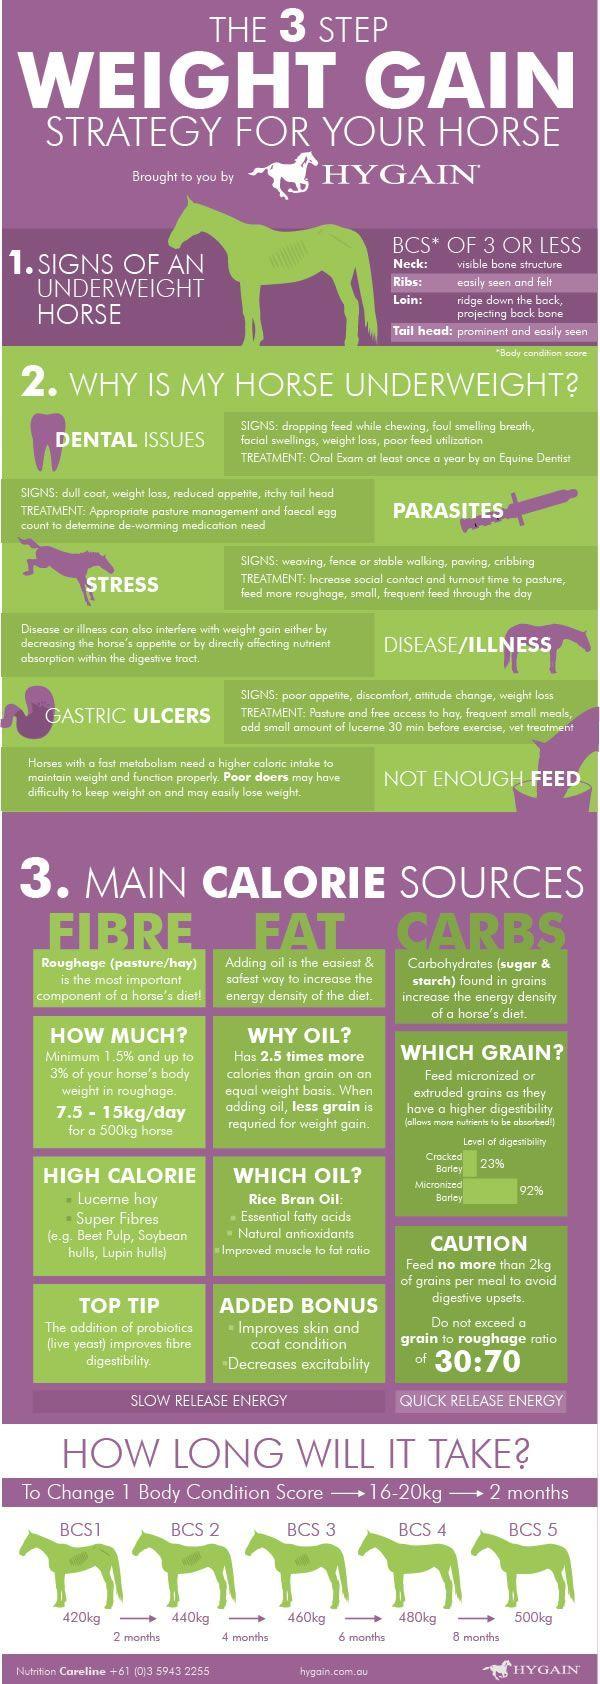 Diabetes Education and Training